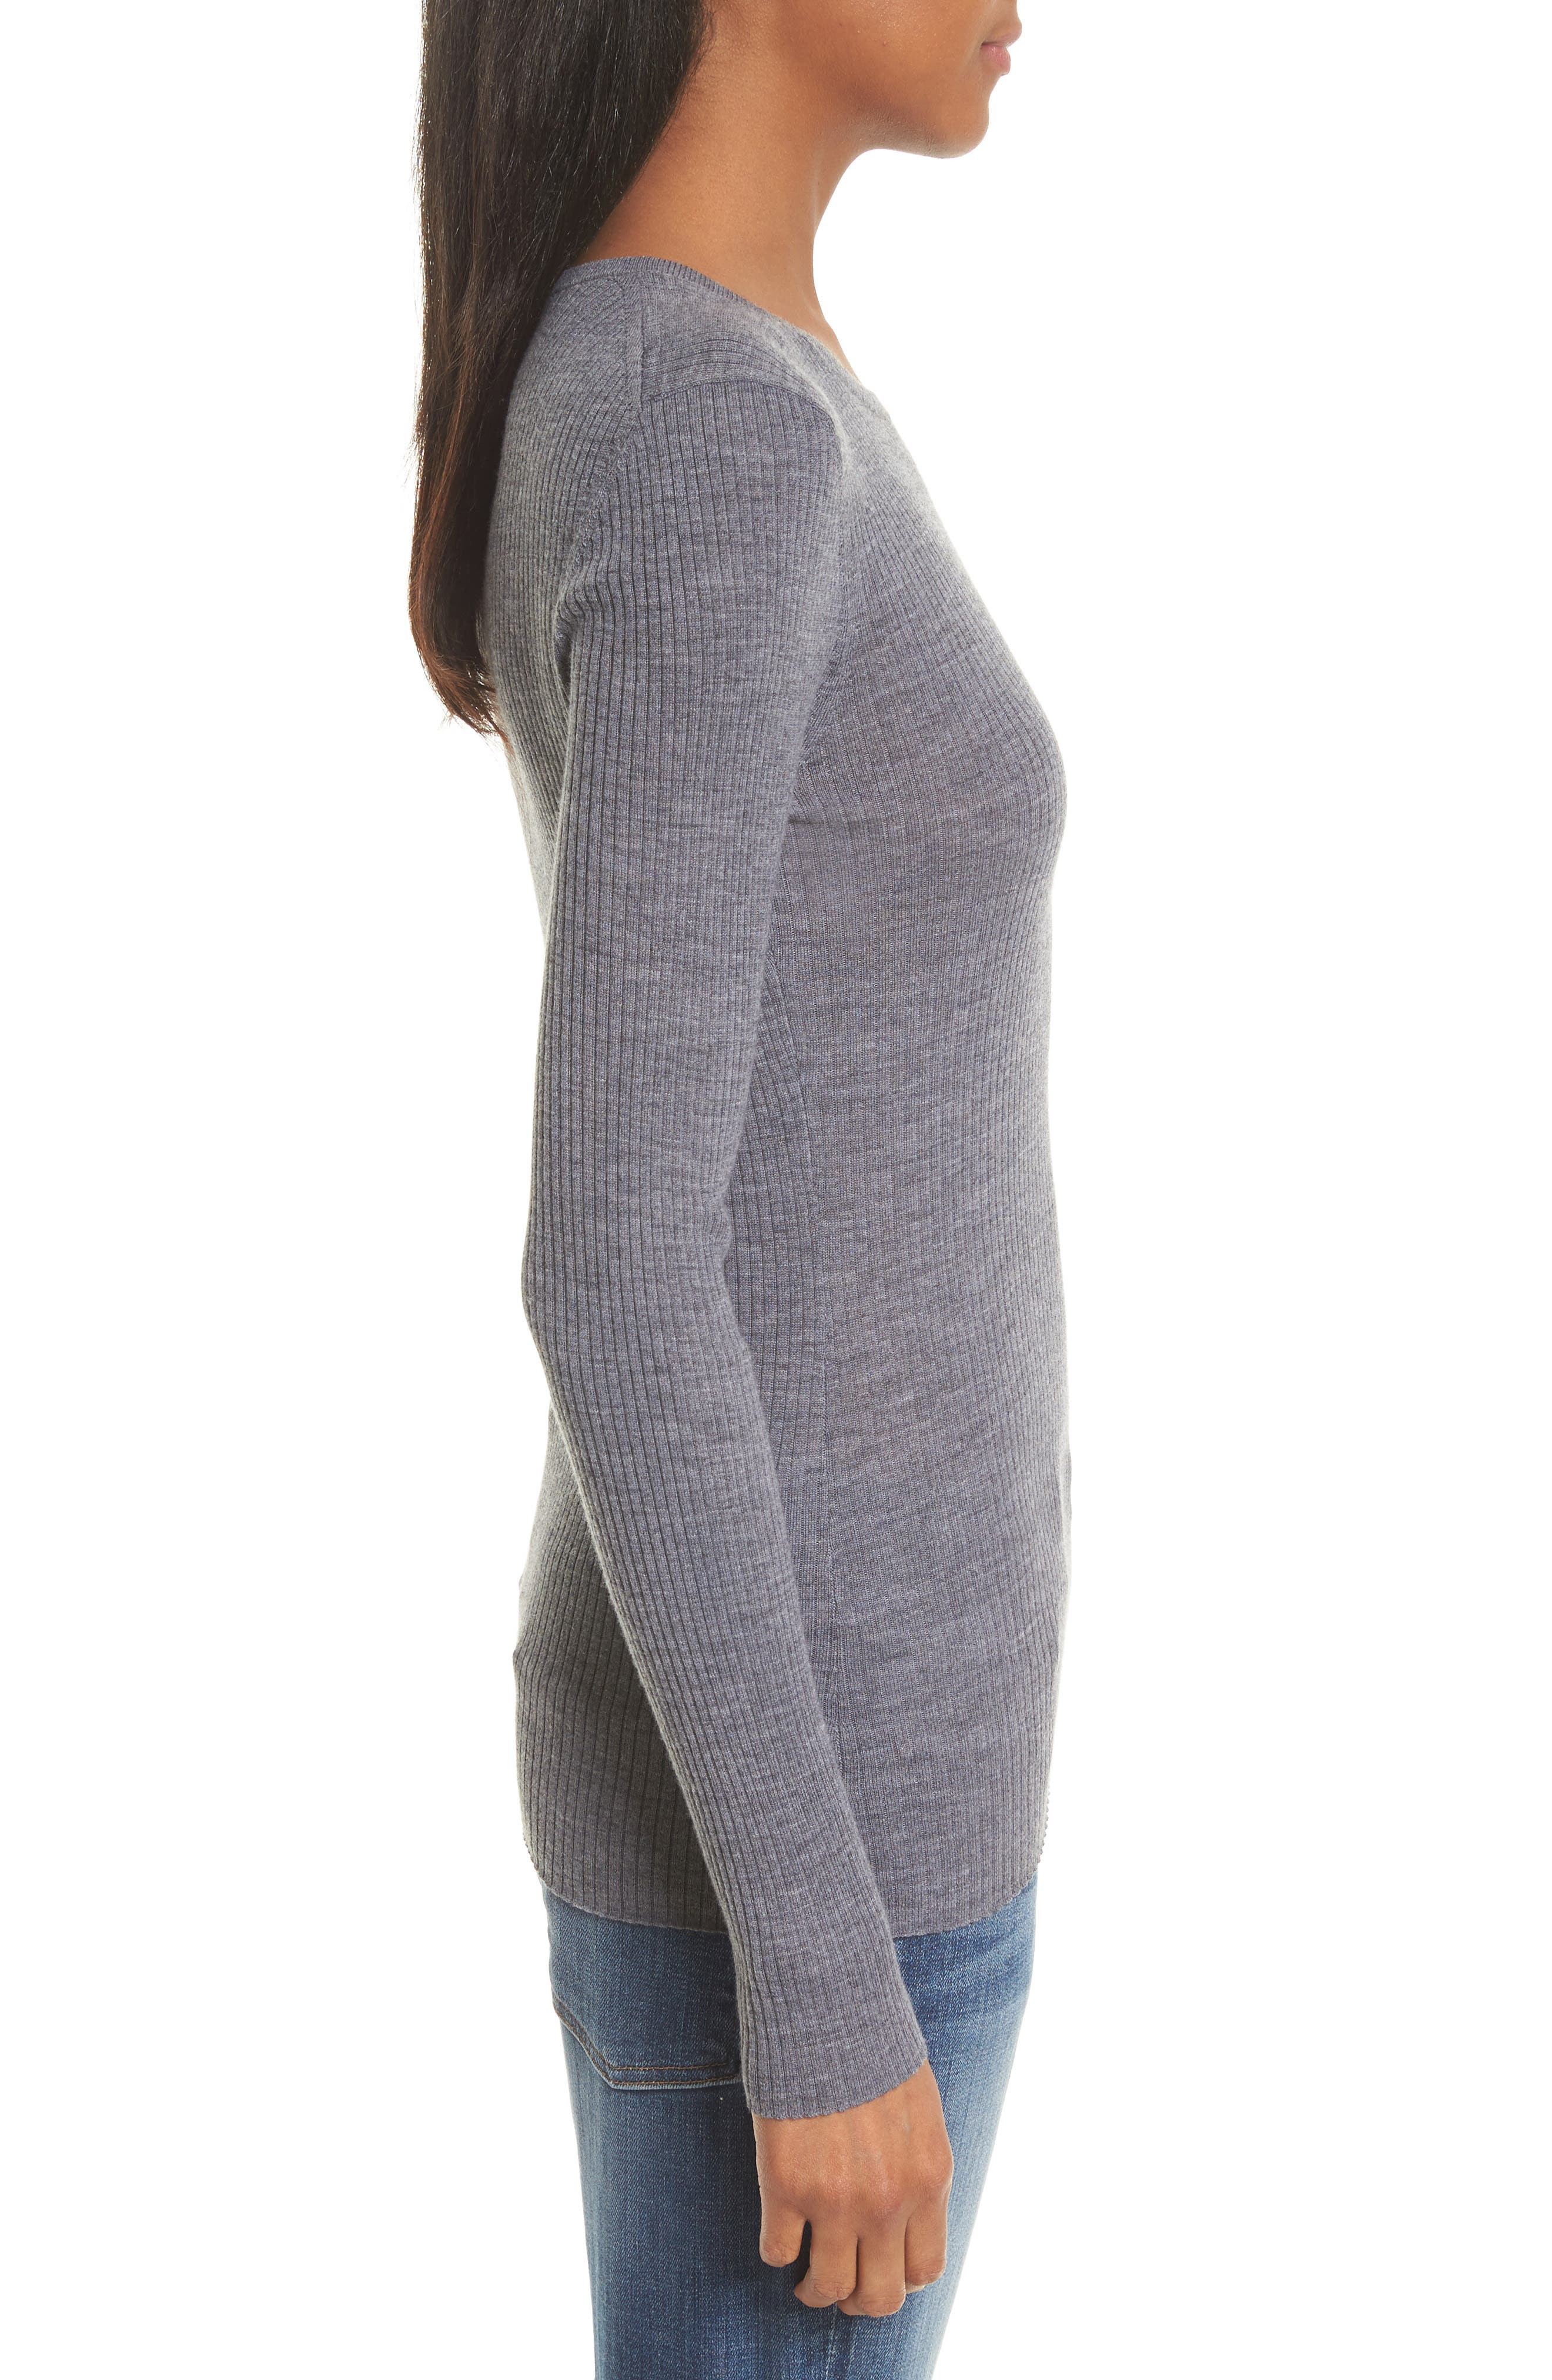 Mirzi B Merino Wool Sweater,                             Alternate thumbnail 3, color,                             059